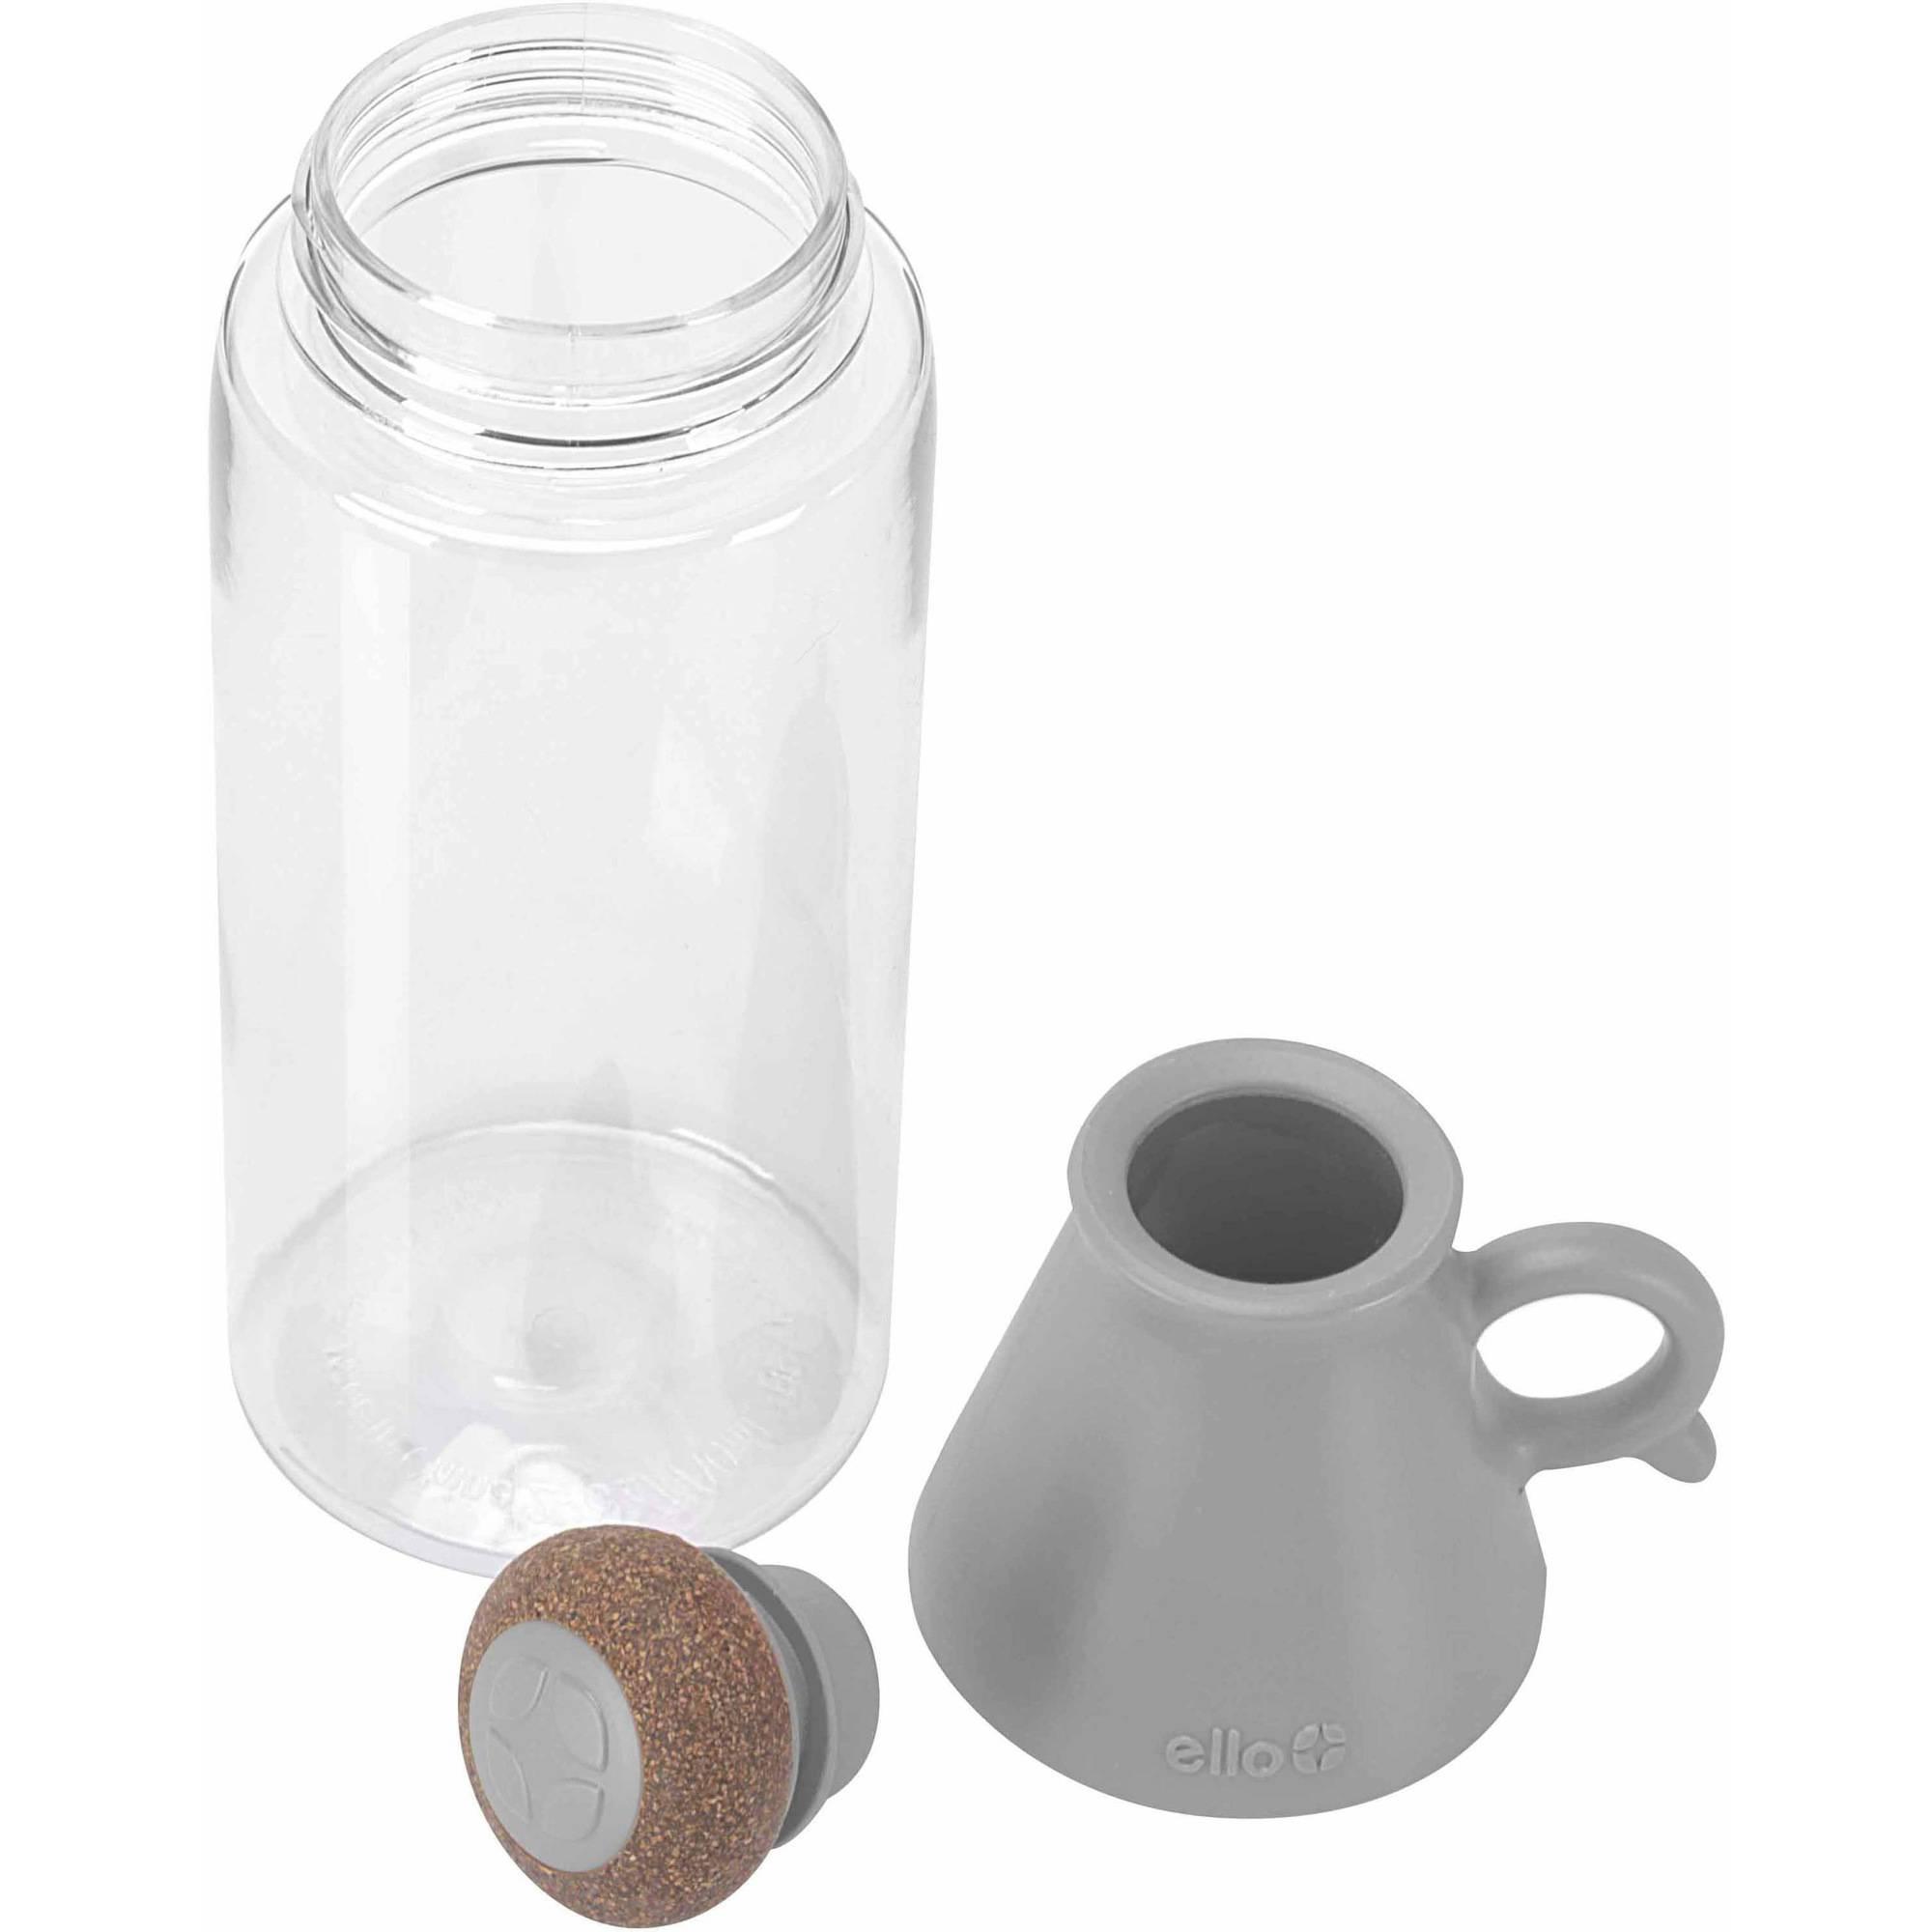 f97742802d Ello Sloan Bpa-free Tritan Water Bottle - Walmart.com